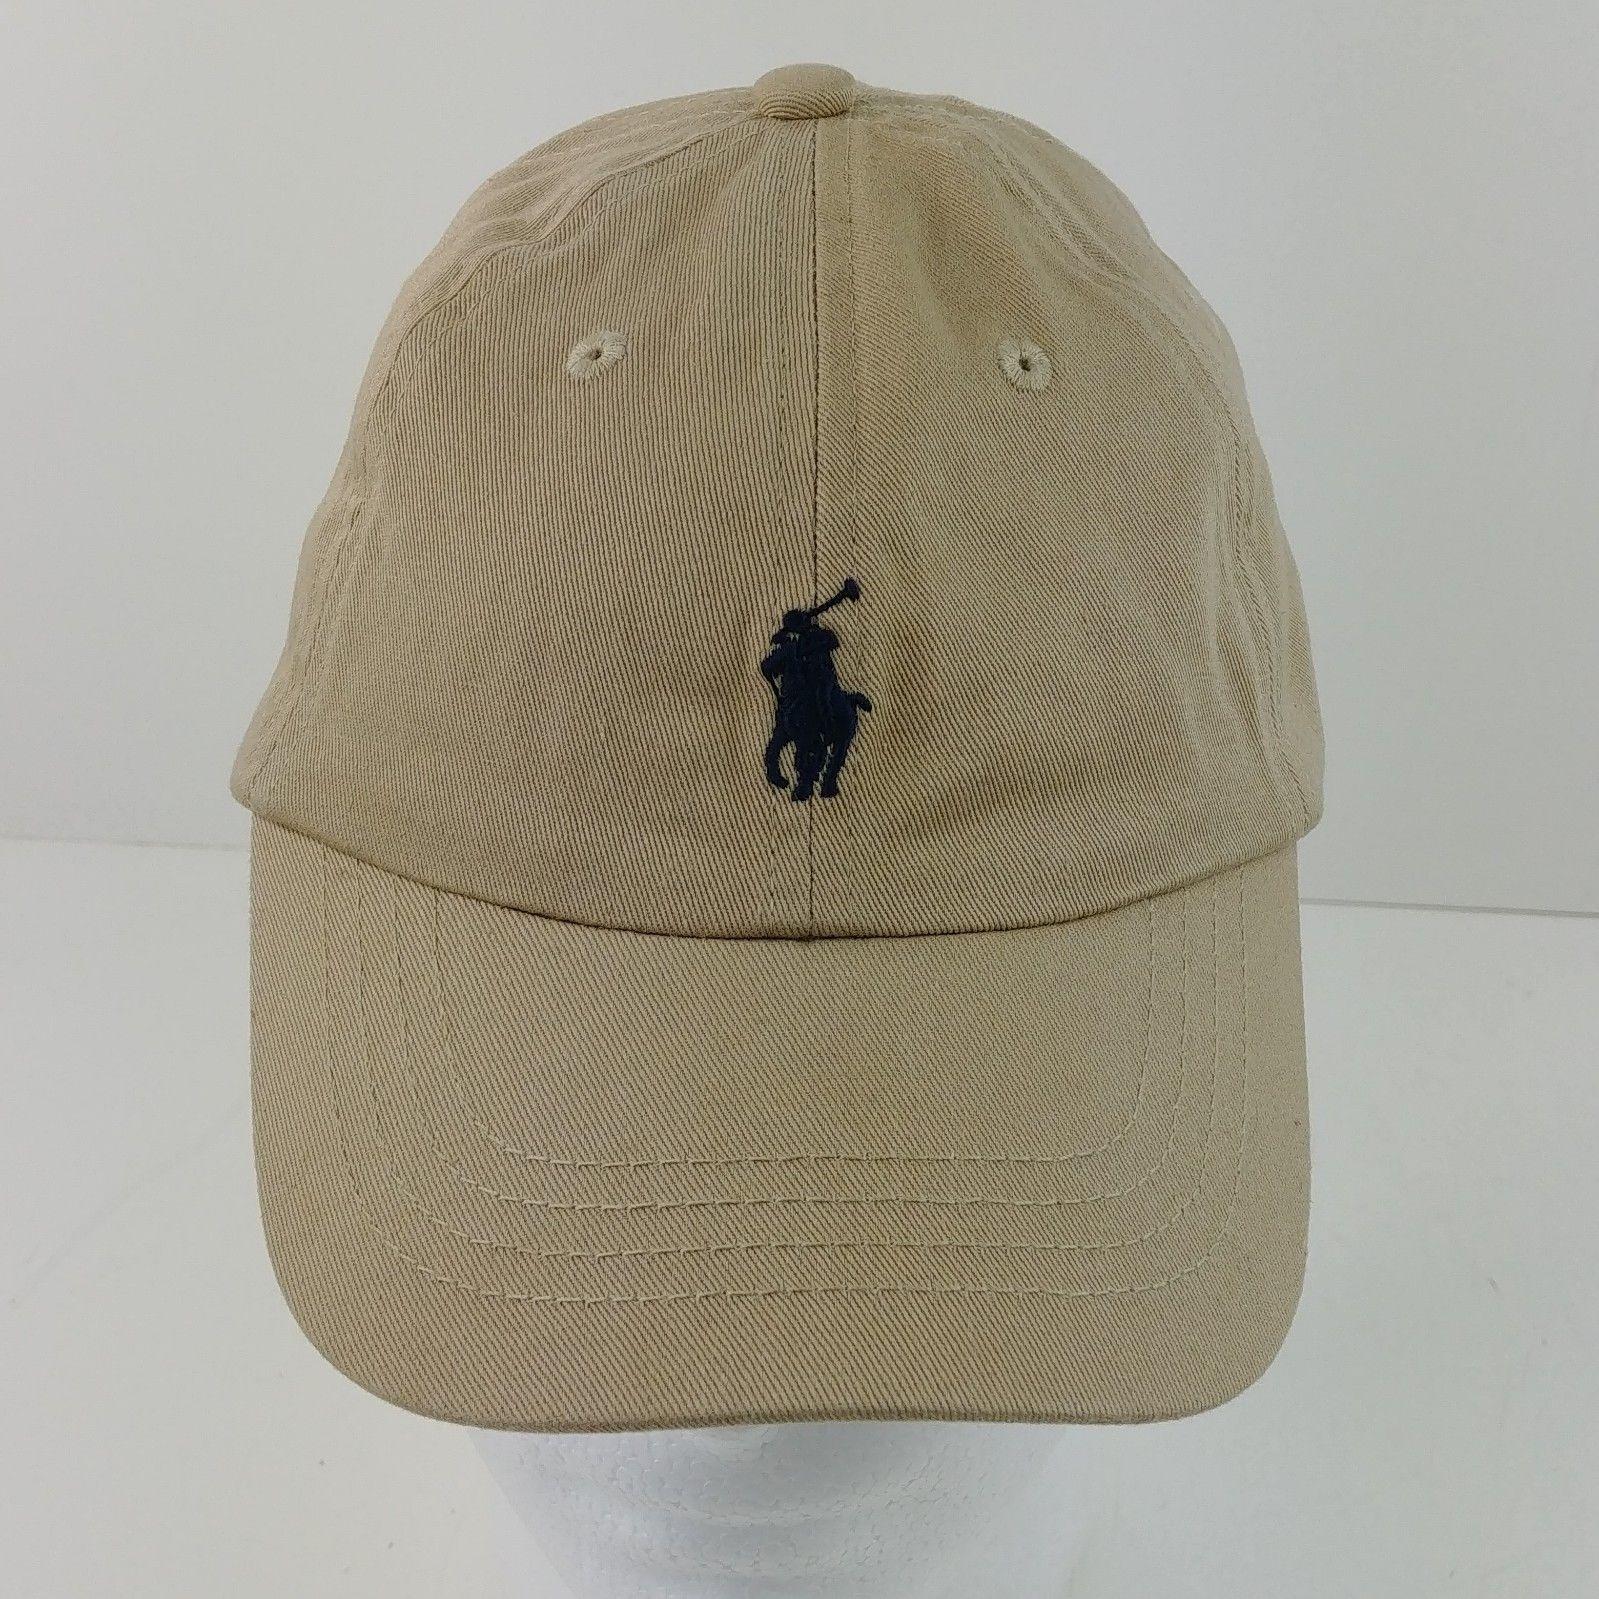 eb0bd121 Polo Ralph Lauren Tan Baseball Snapback Cap Hat 100% Cotten – Lot #40